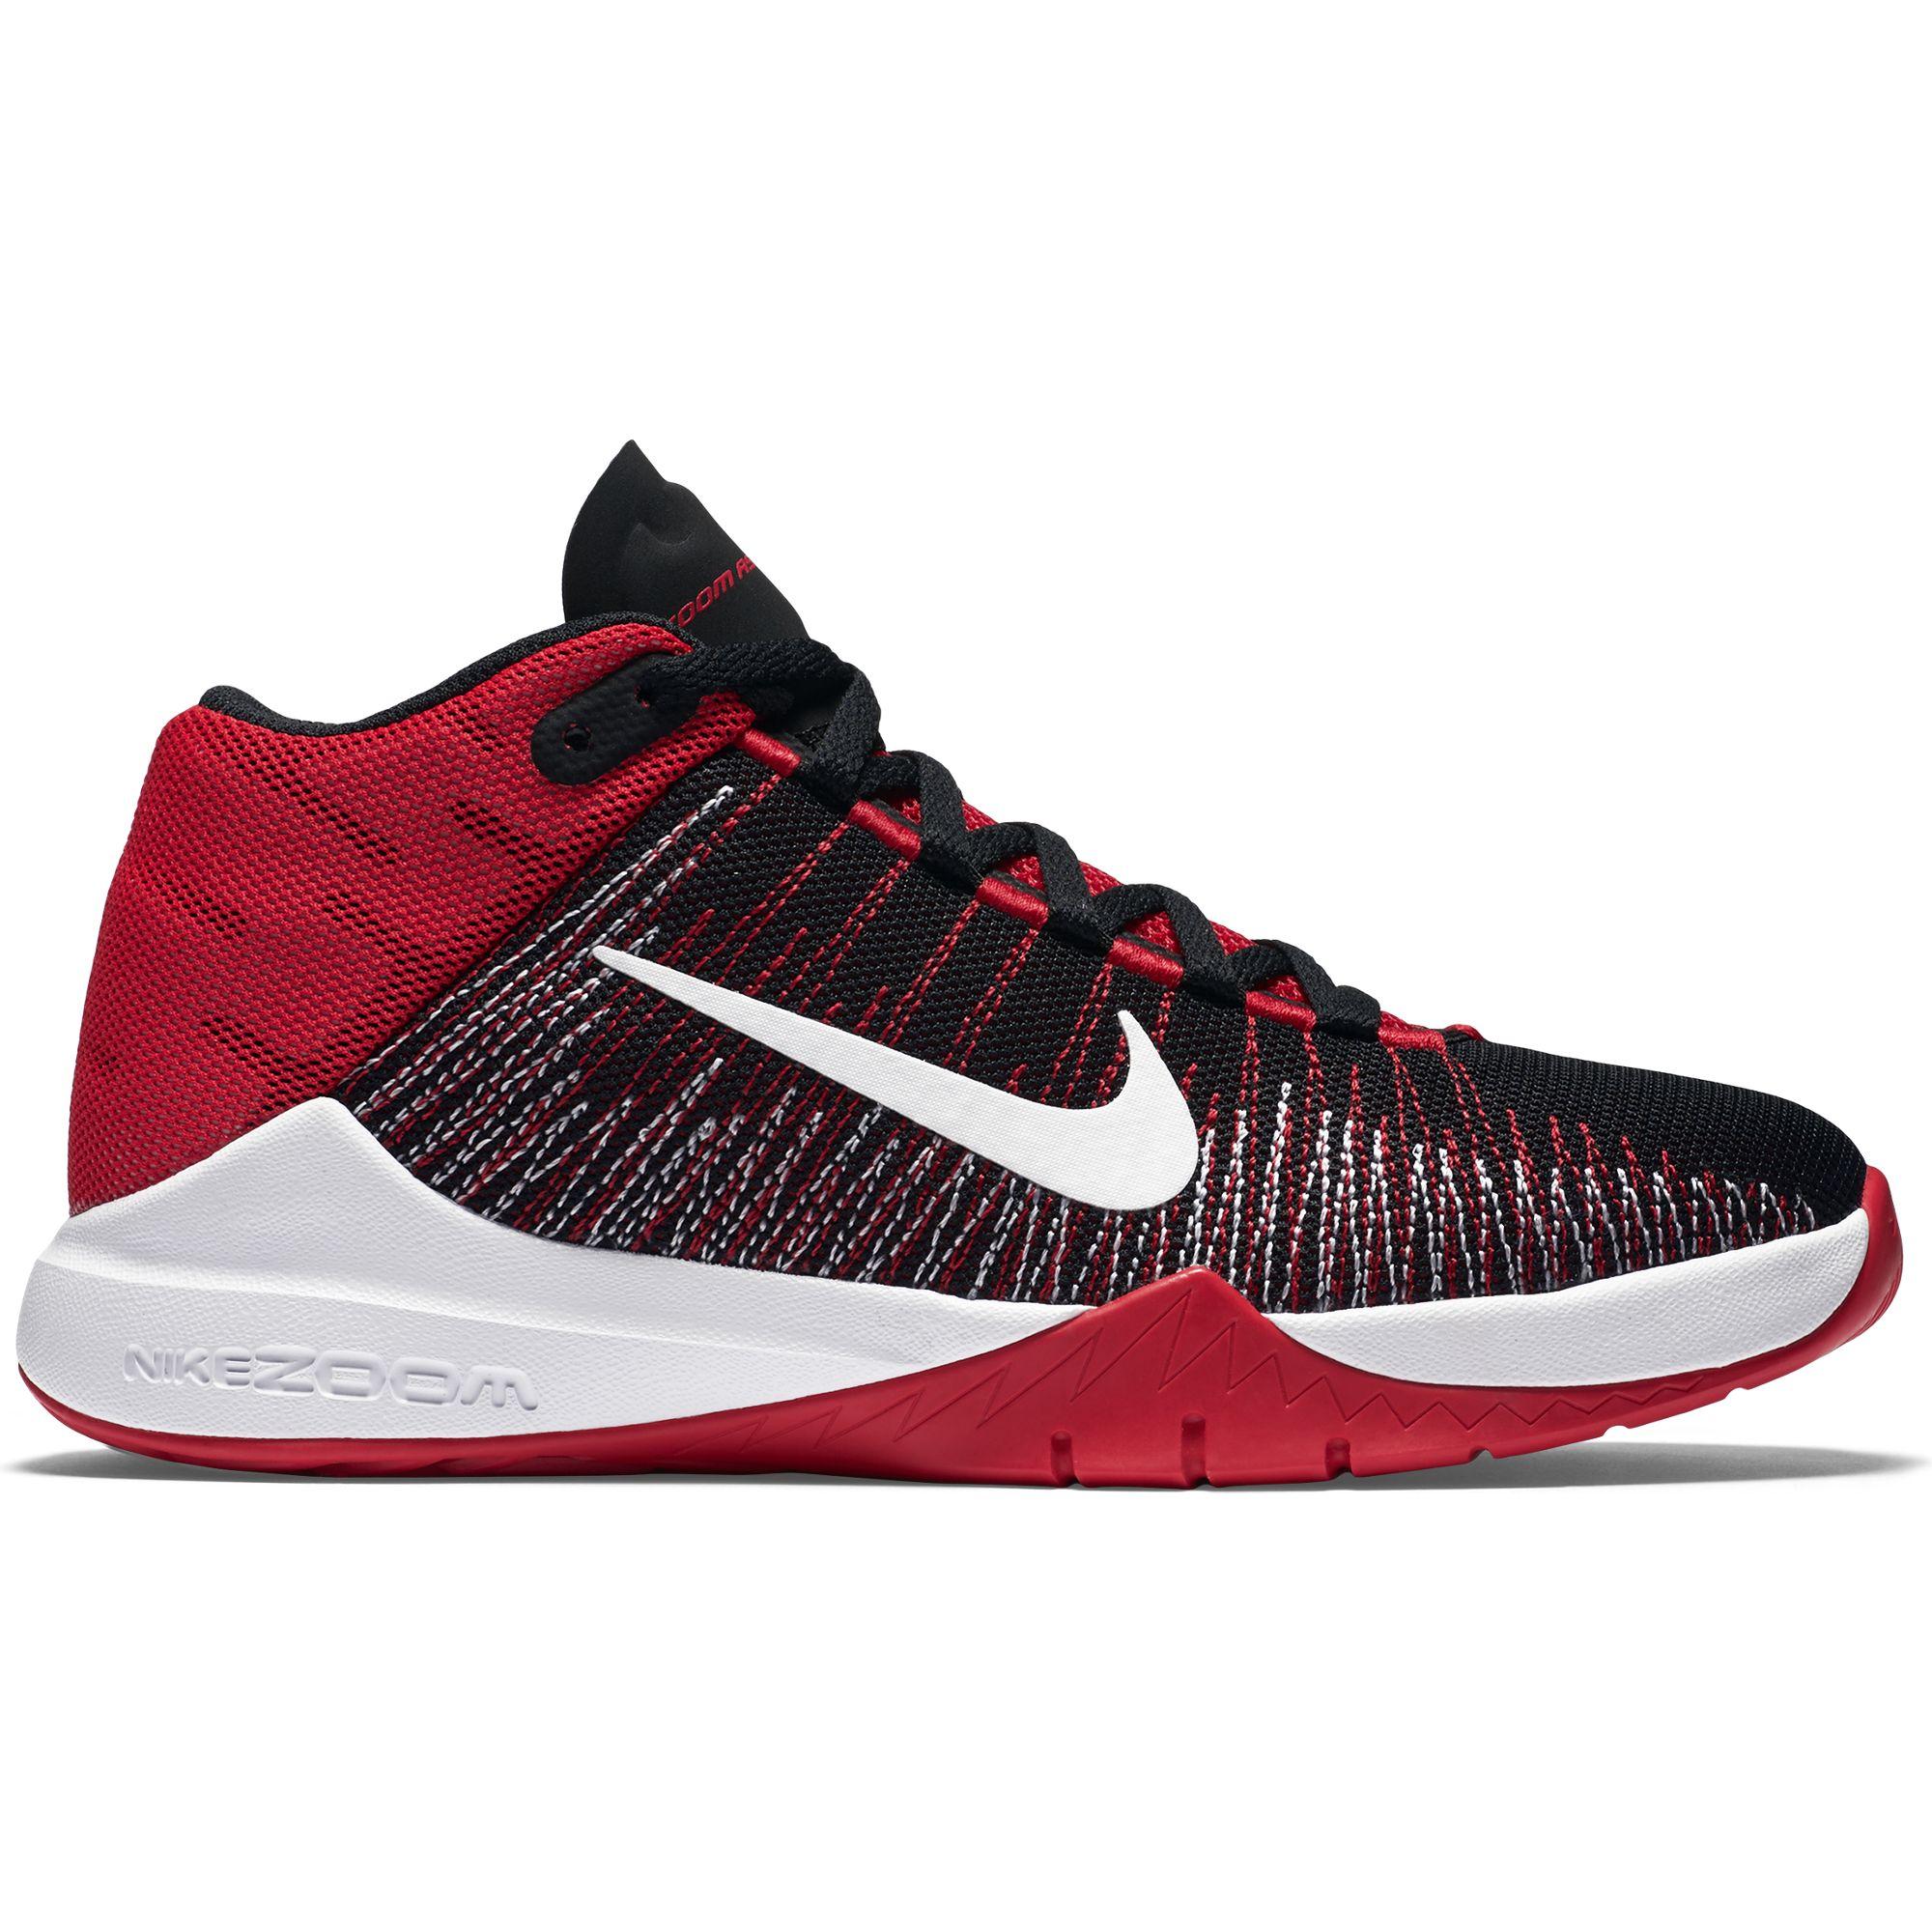 5b4622e49fdb16 Boy s Nike Zoom Ascention (GS) Basketball Shoe - Sieverts Sporting Goods